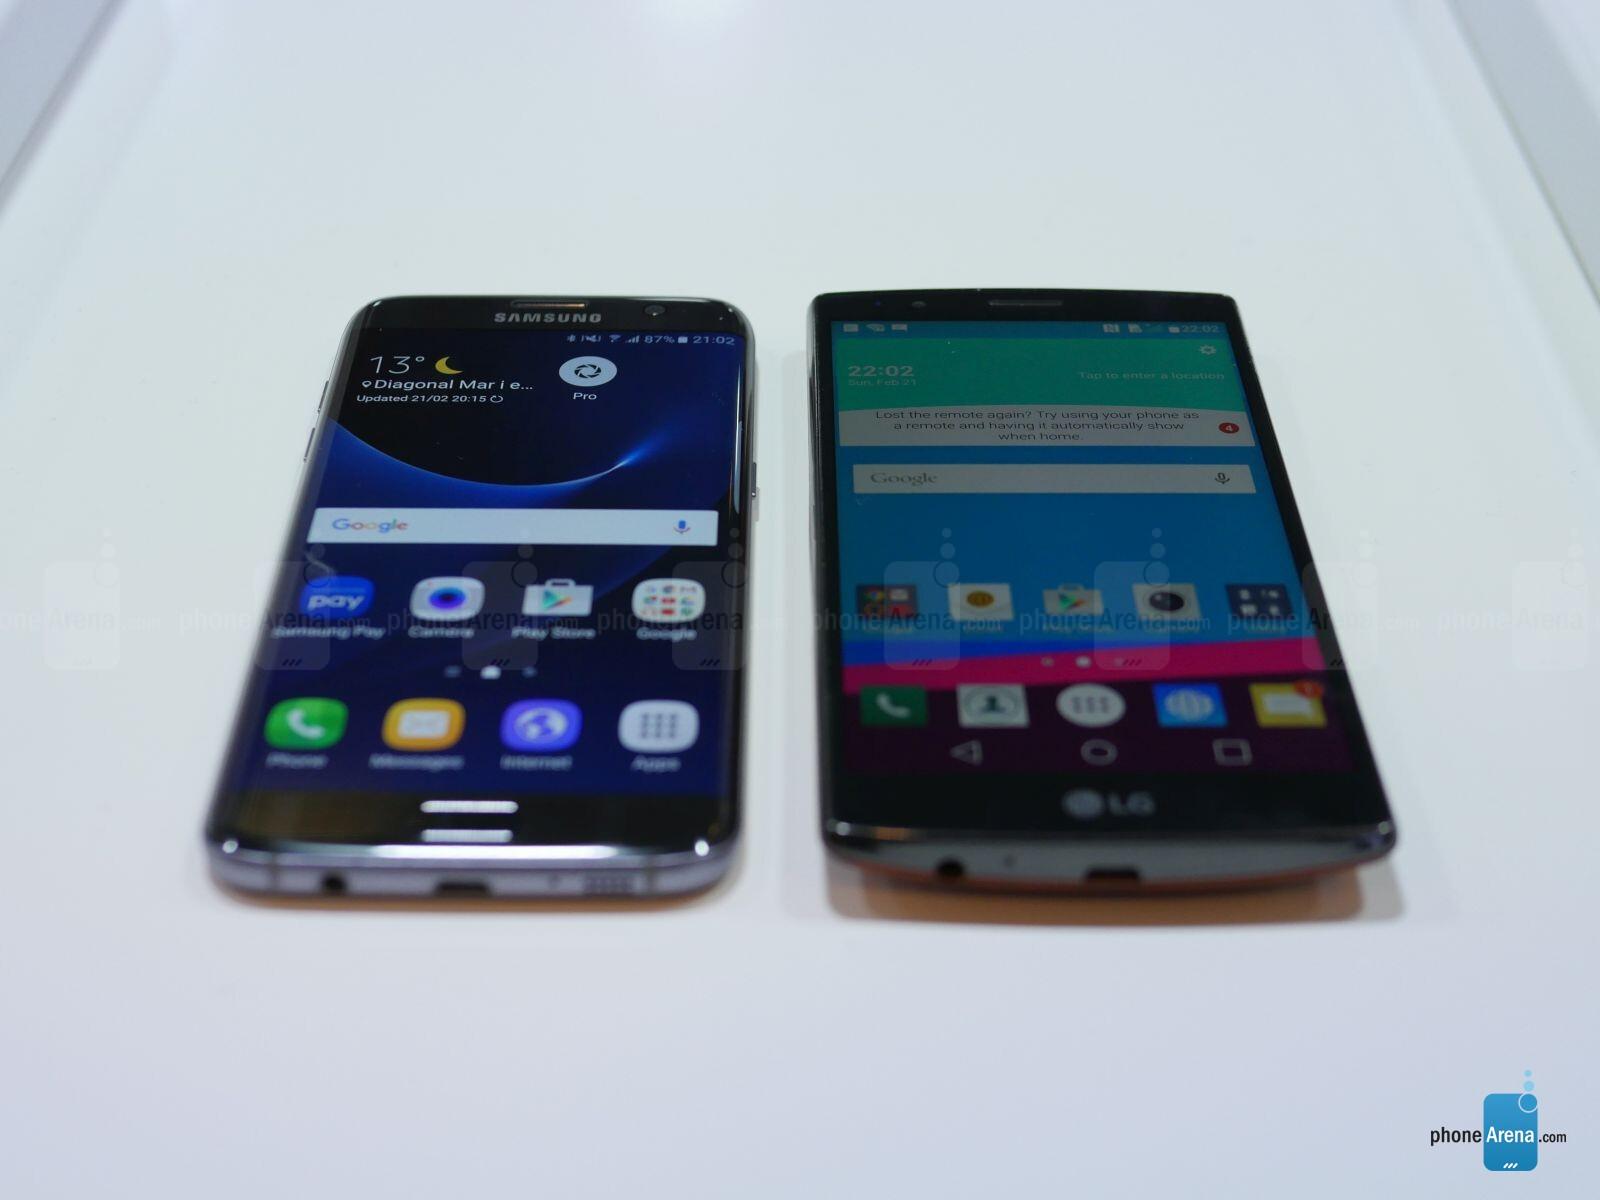 Samsung Galaxy S7 Edge Vs LG G4: First Look